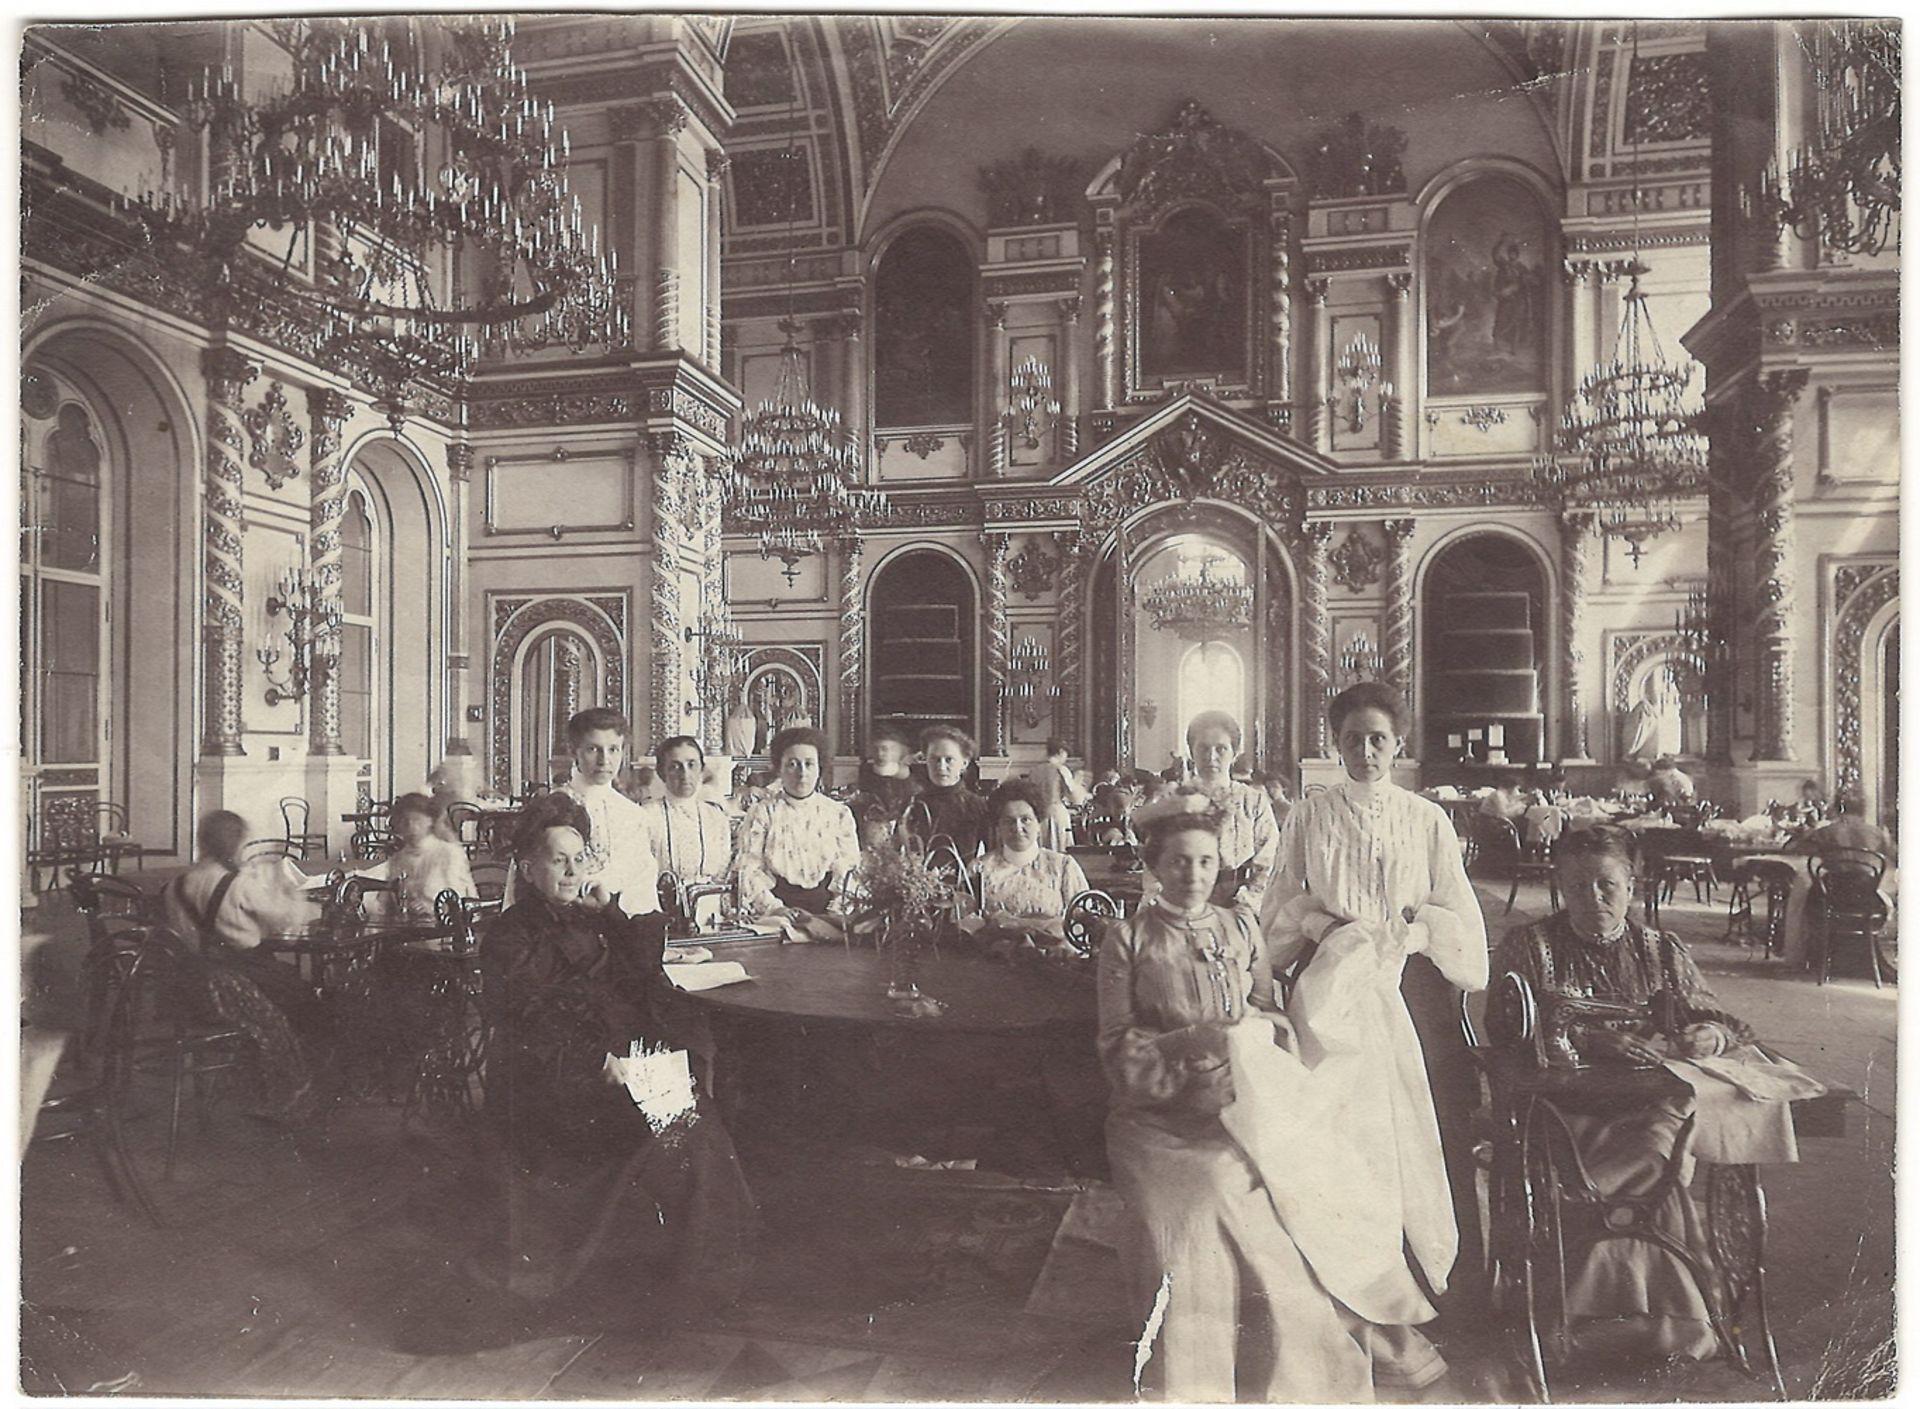 [Russian Empire]. Grand Duchesses  in Aleksander's hall of Grand Kremlin Palace. Photograph. Vintage